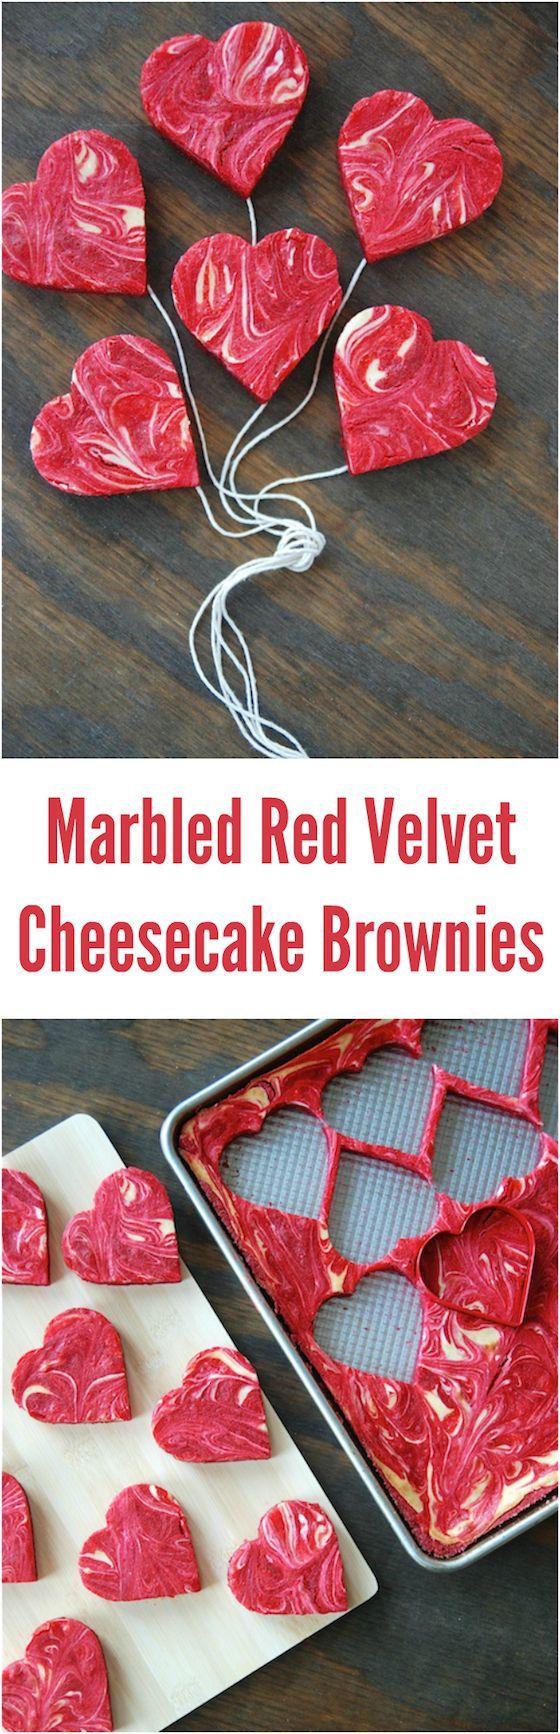 Marbled Red Velvet Cheesecake Brownies! Perfect Valentine's Day dessert!